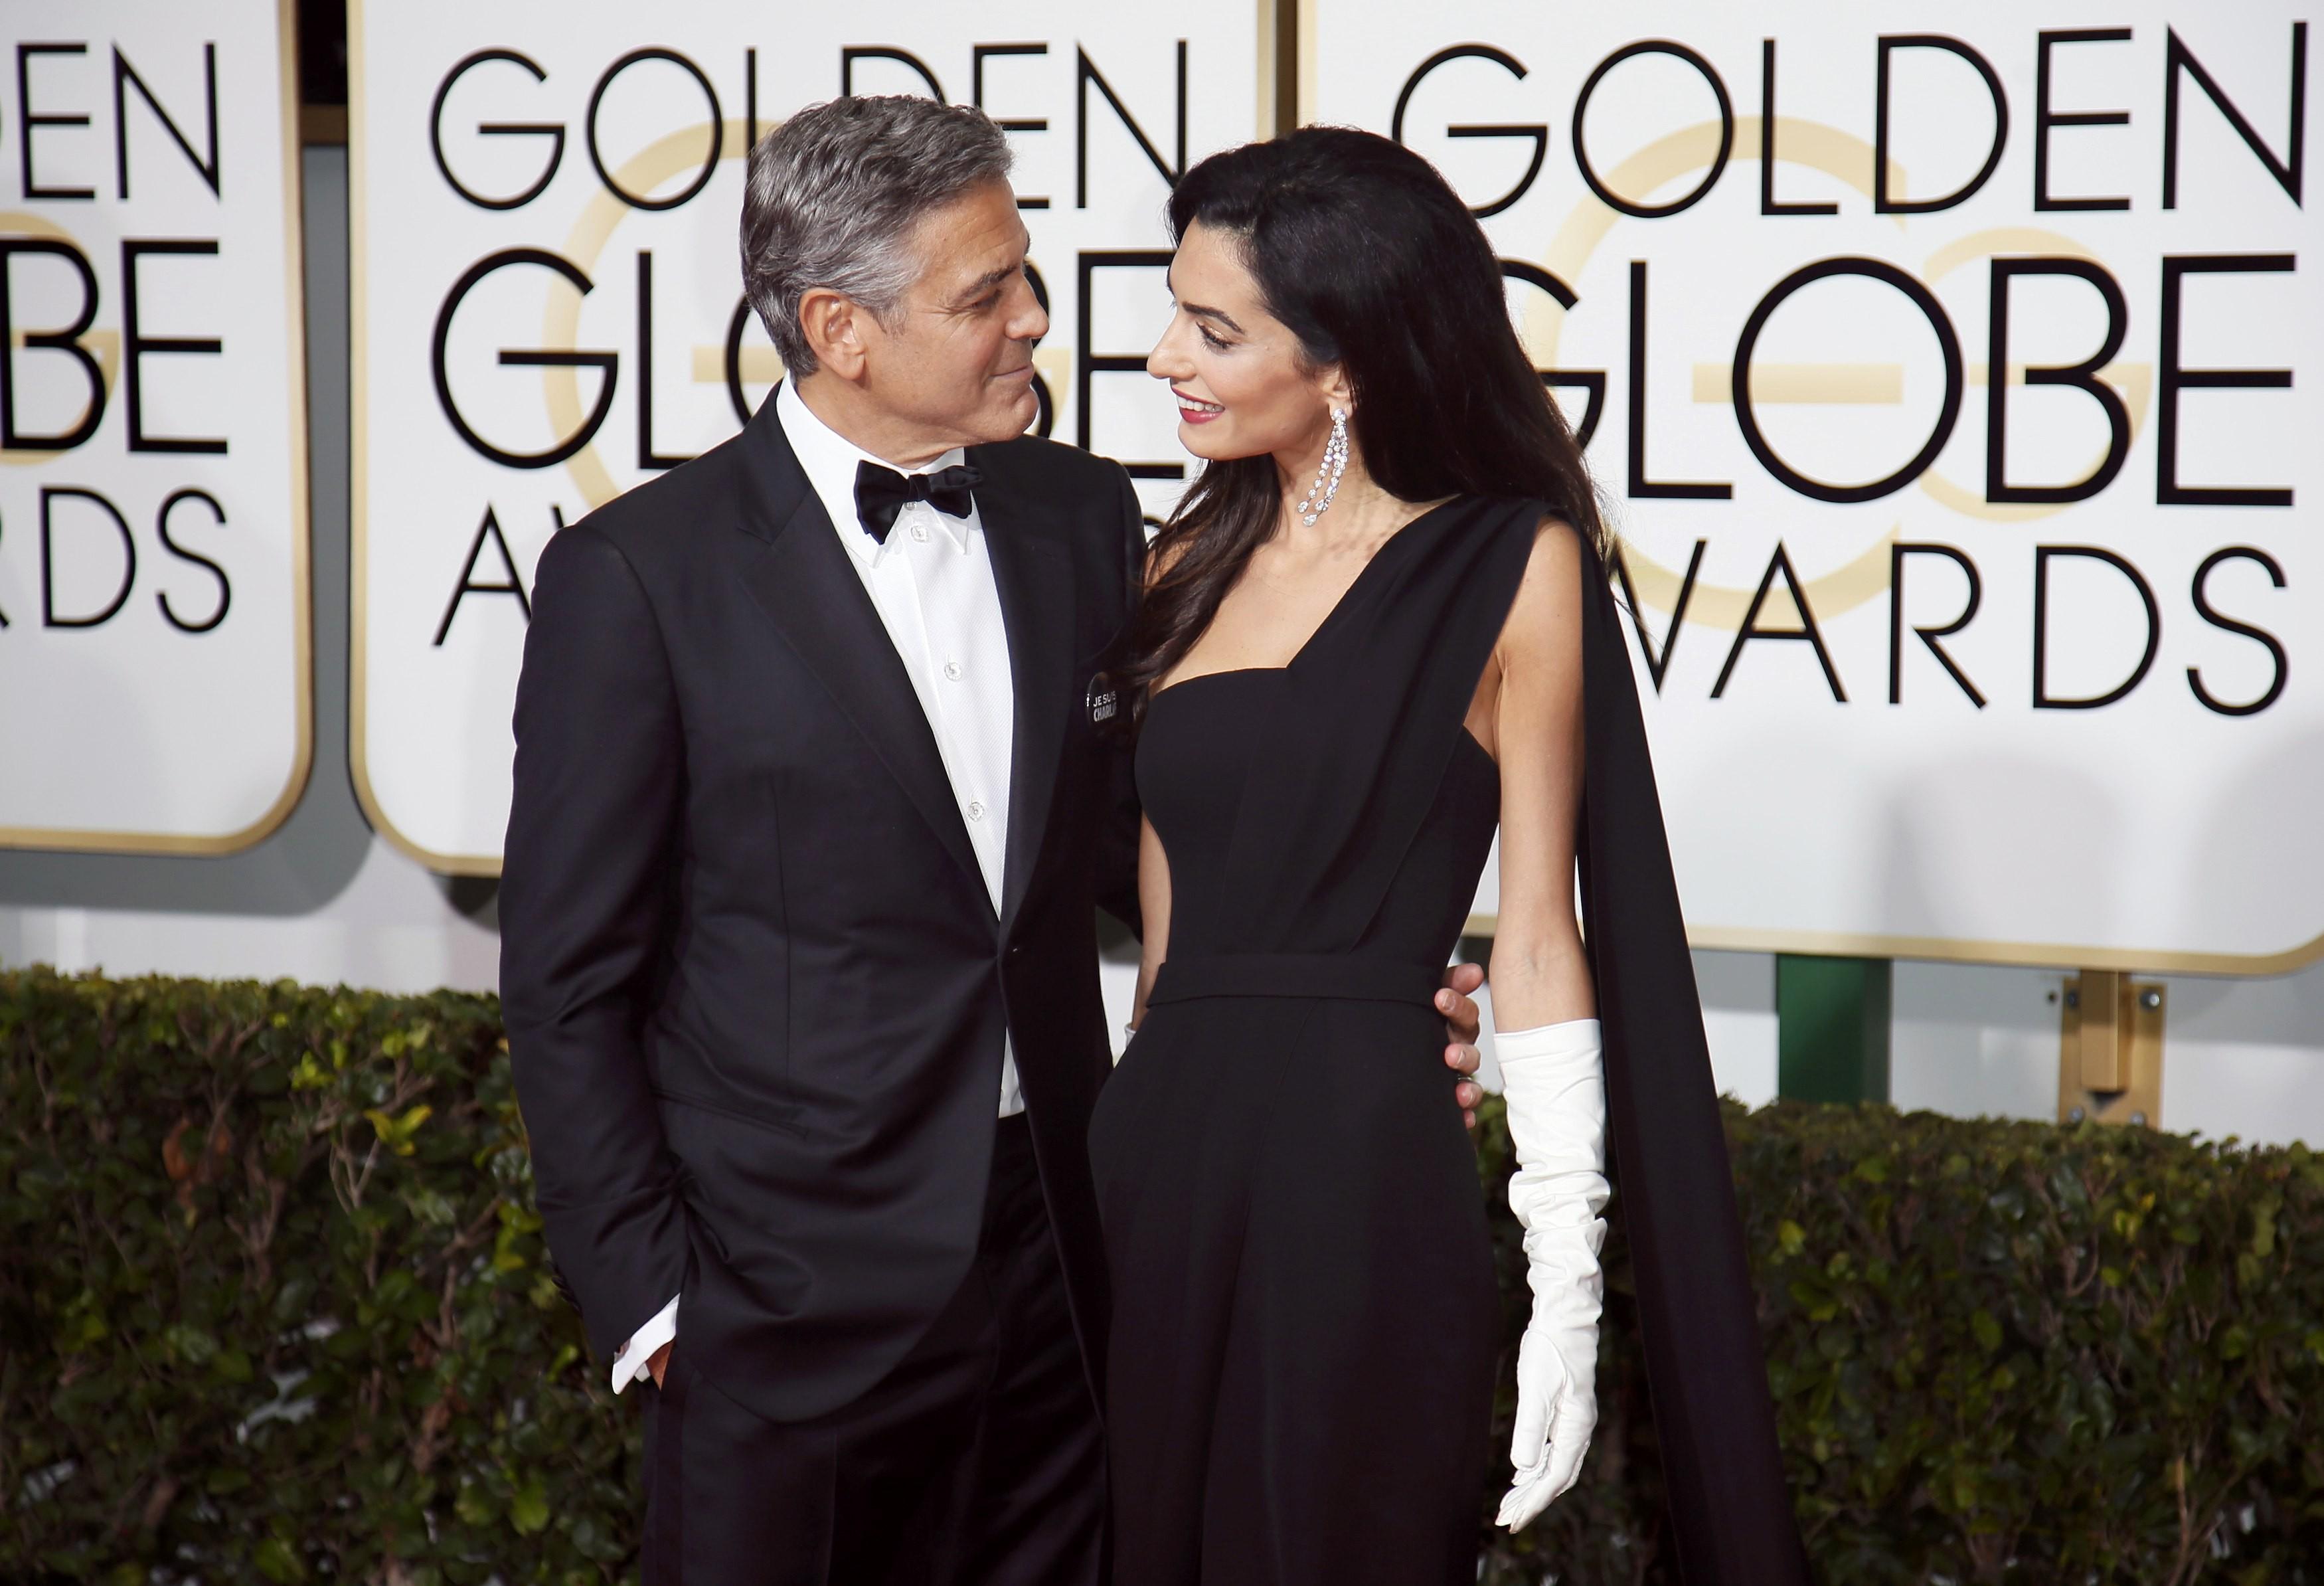 جورج كلوني وزوجته يستقبلان طفليهما في لندن